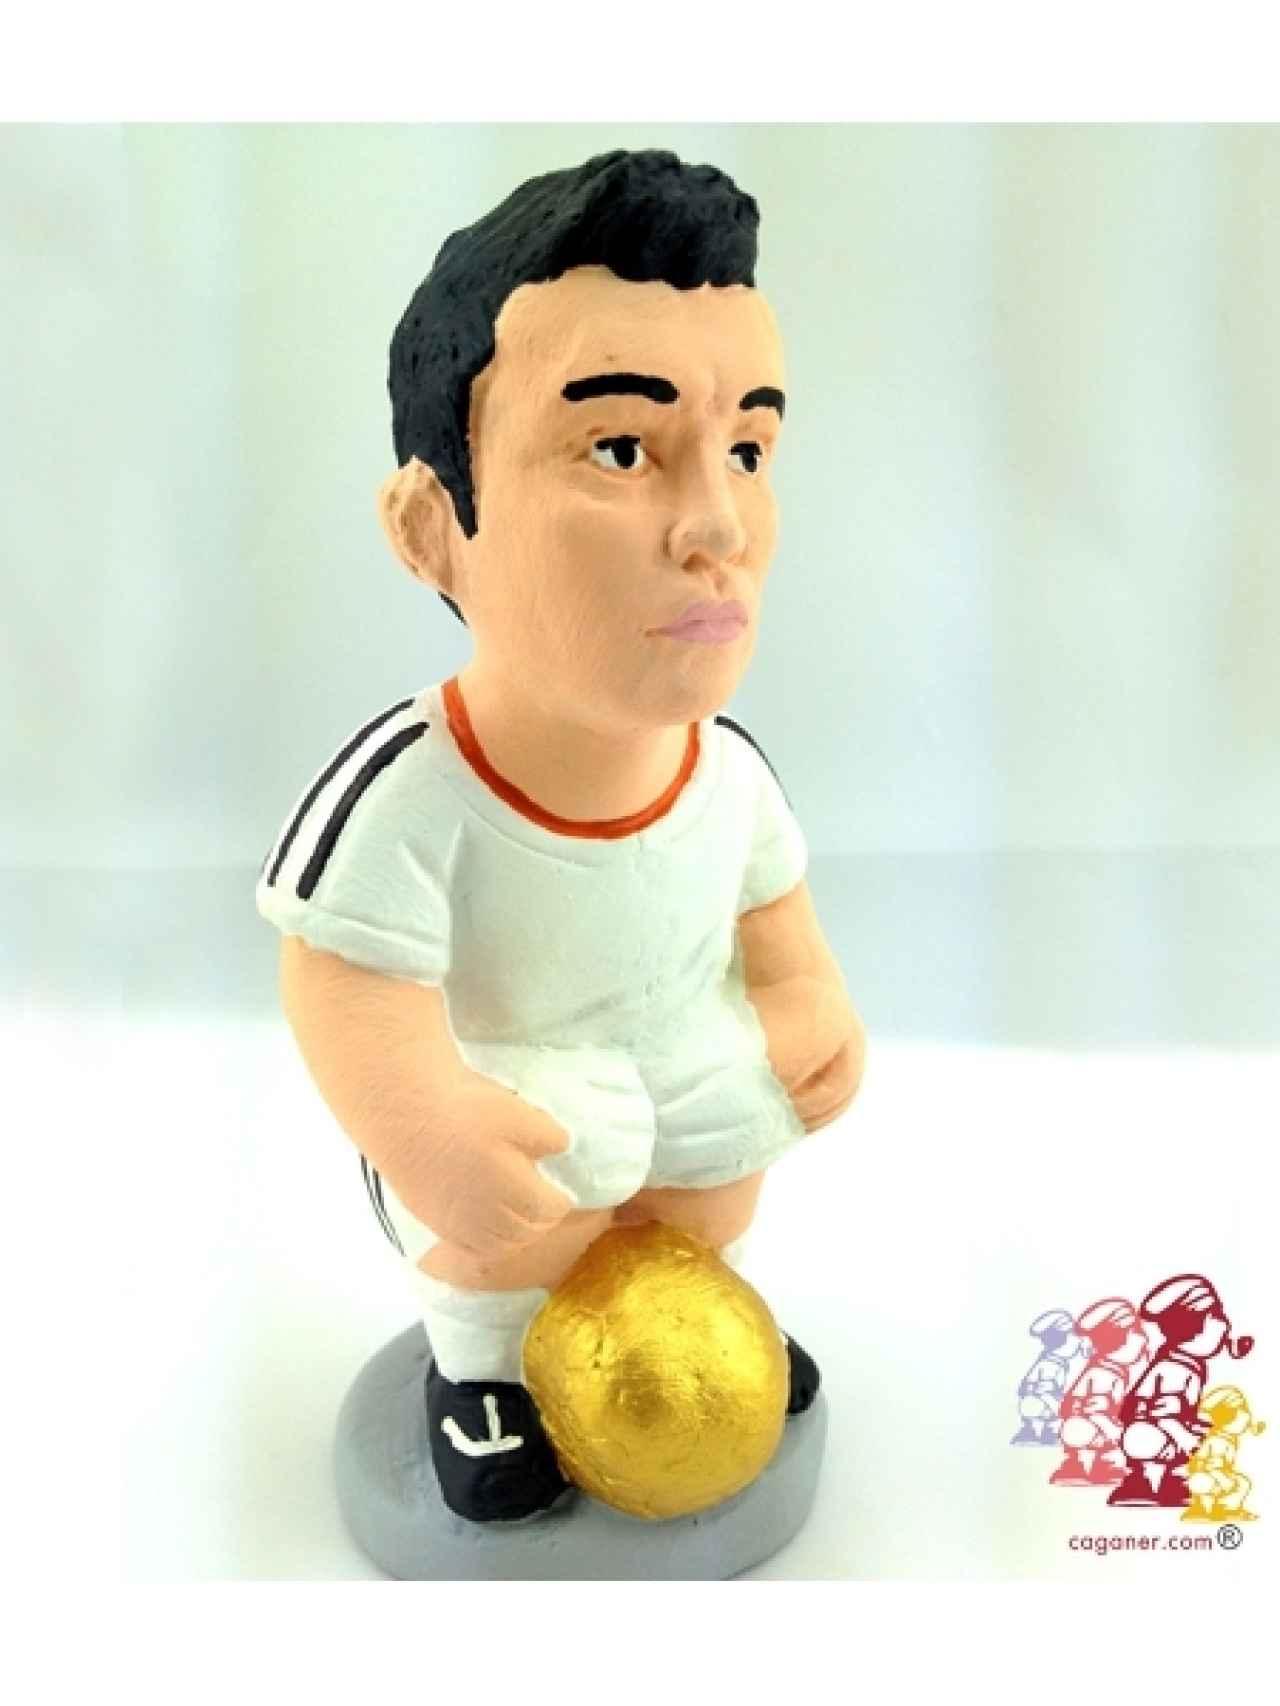 El futbolista Cristiano Ronaldo